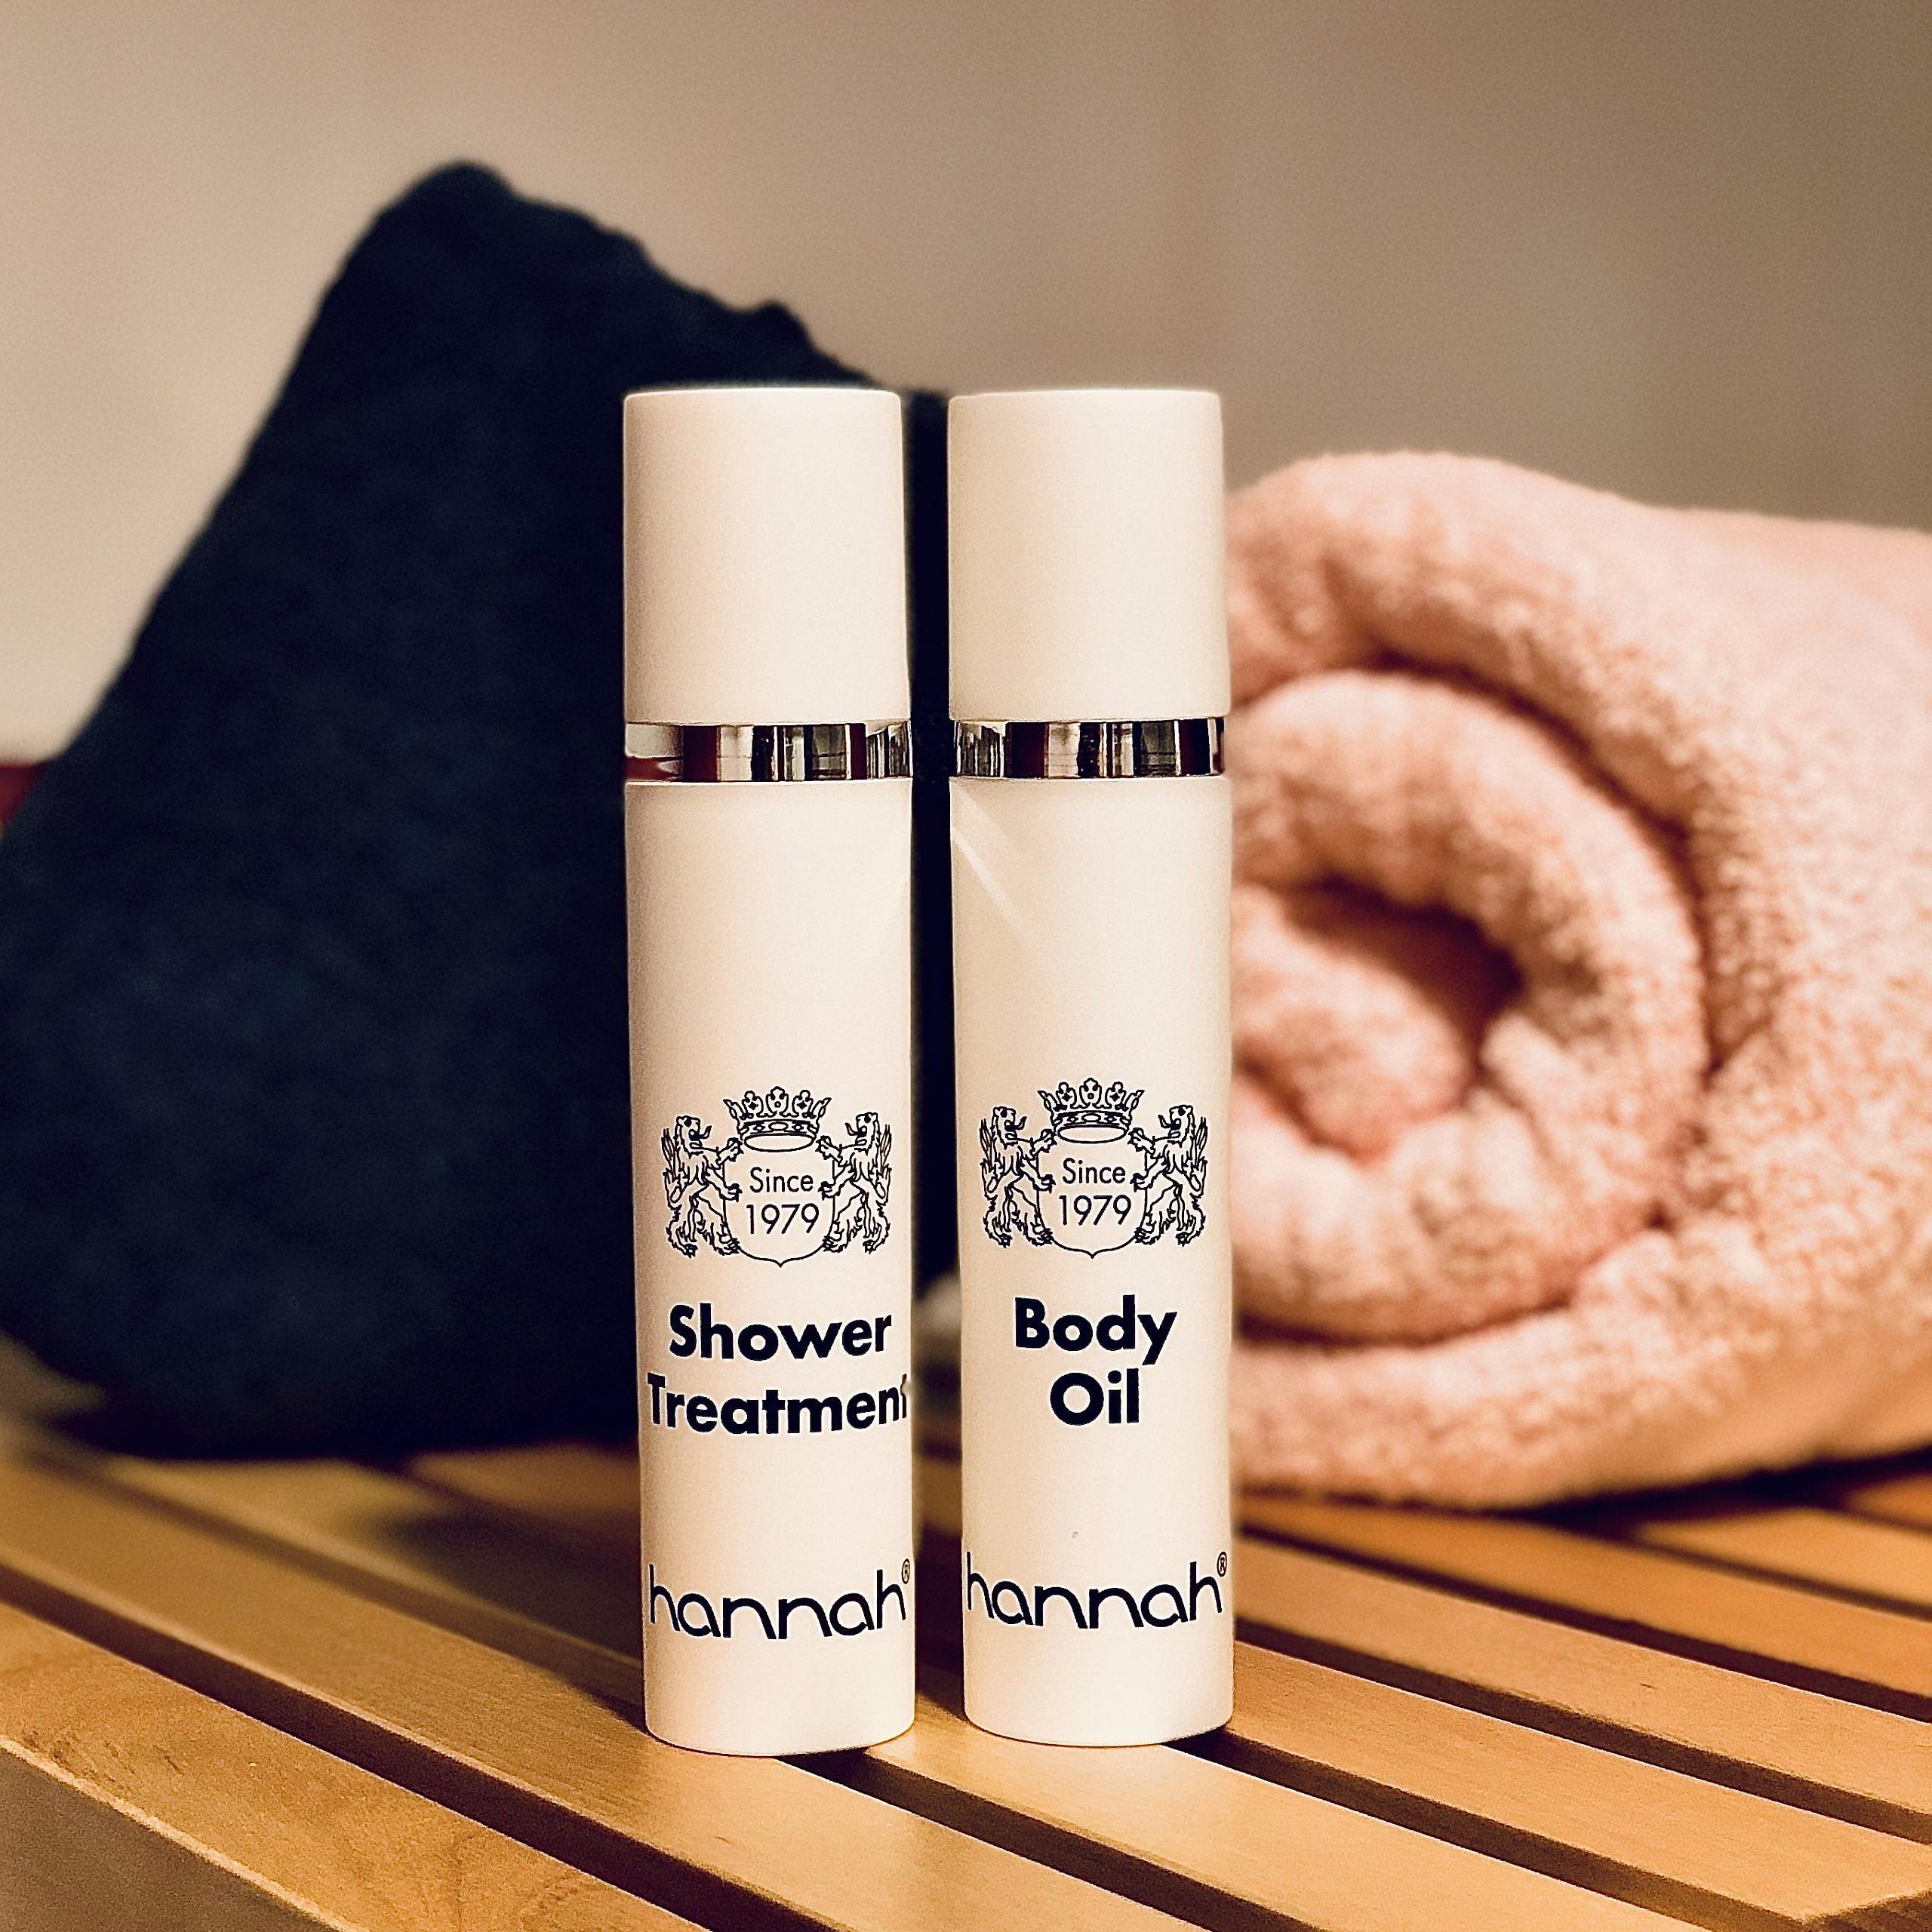 hannah_Shower Treatment_Body Oil